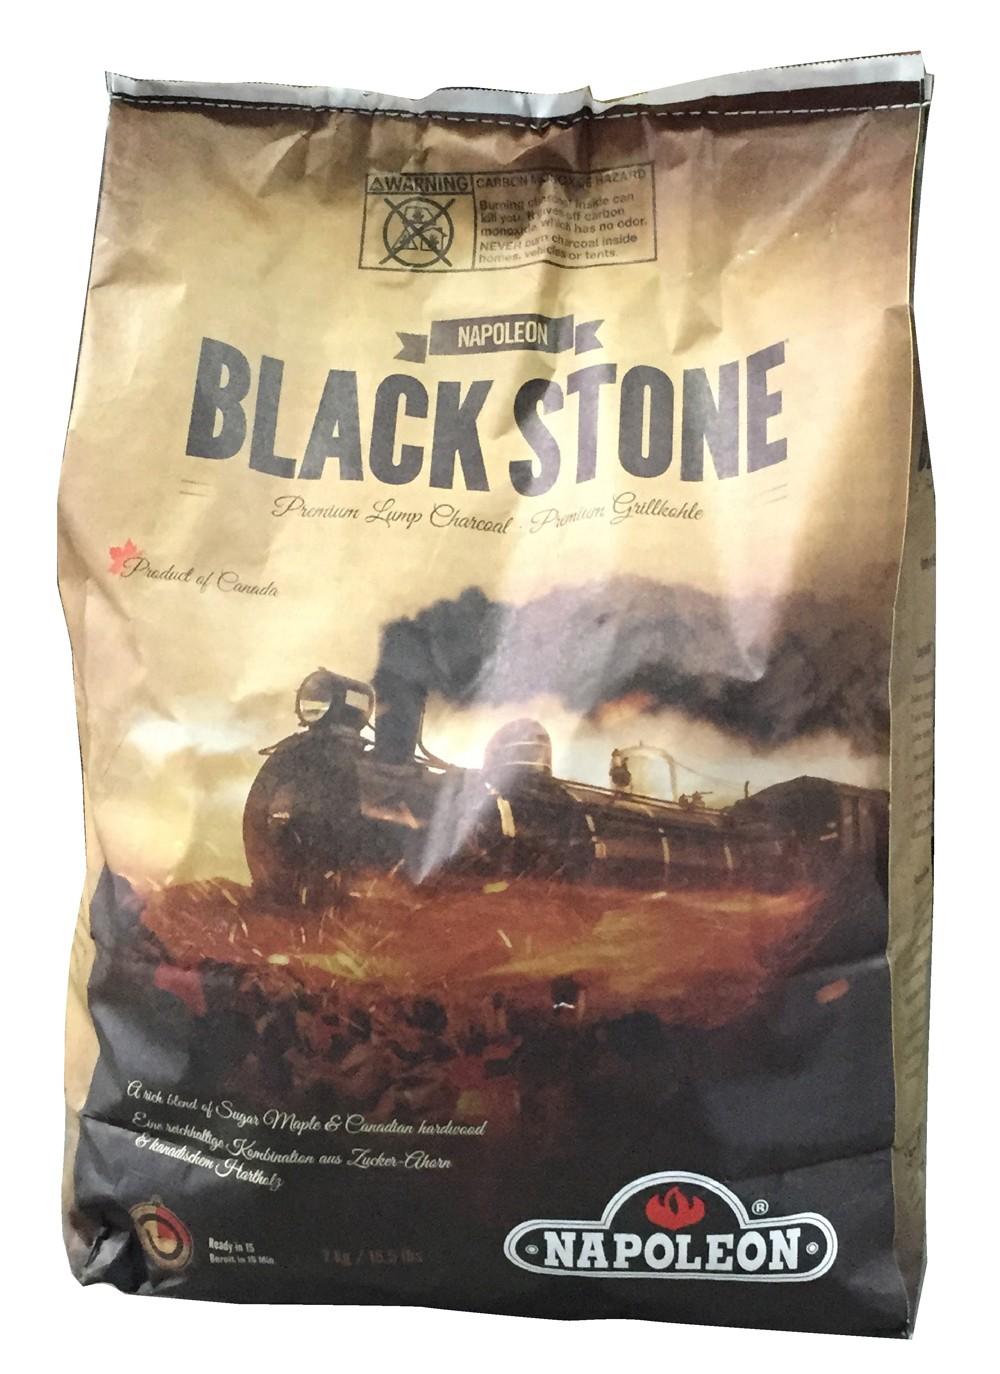 Holzkohle Blackstone Napoleon 7 kg Bild 1